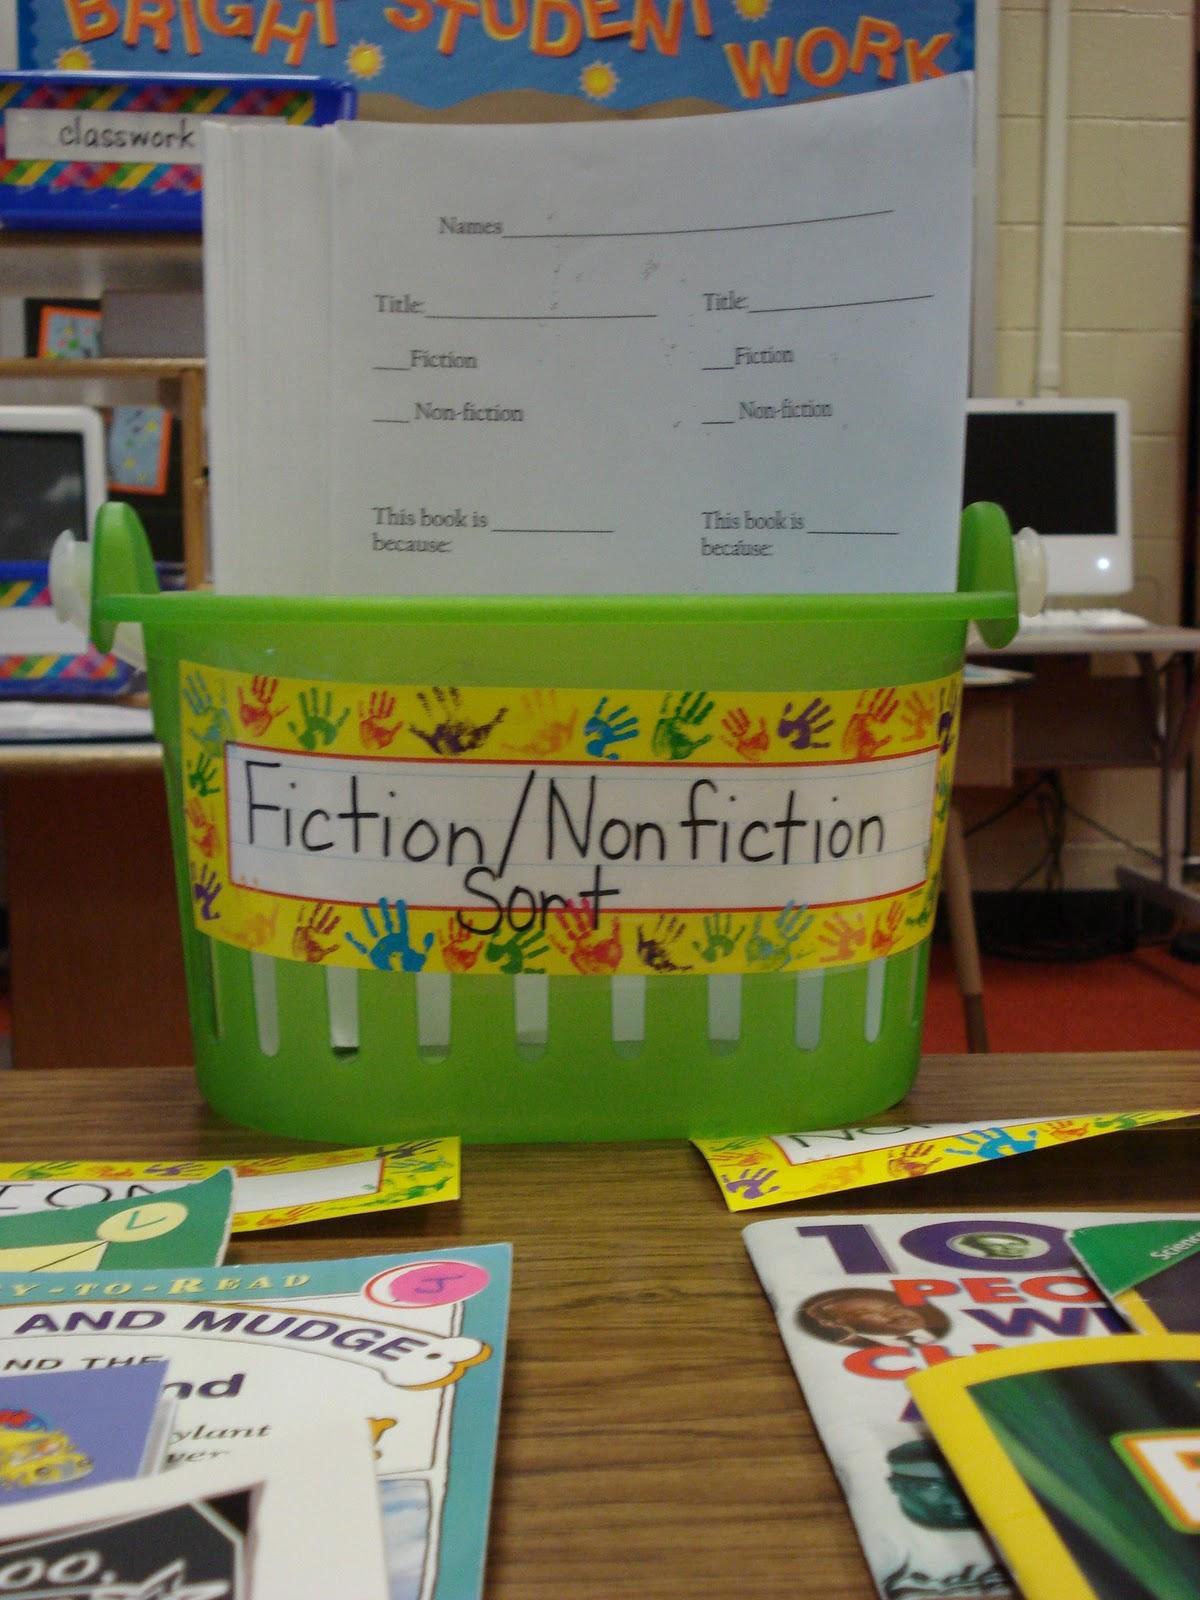 fiction vs nonfiction venn diagram rat digestive system quiz stuckey in second non oct 31 2010